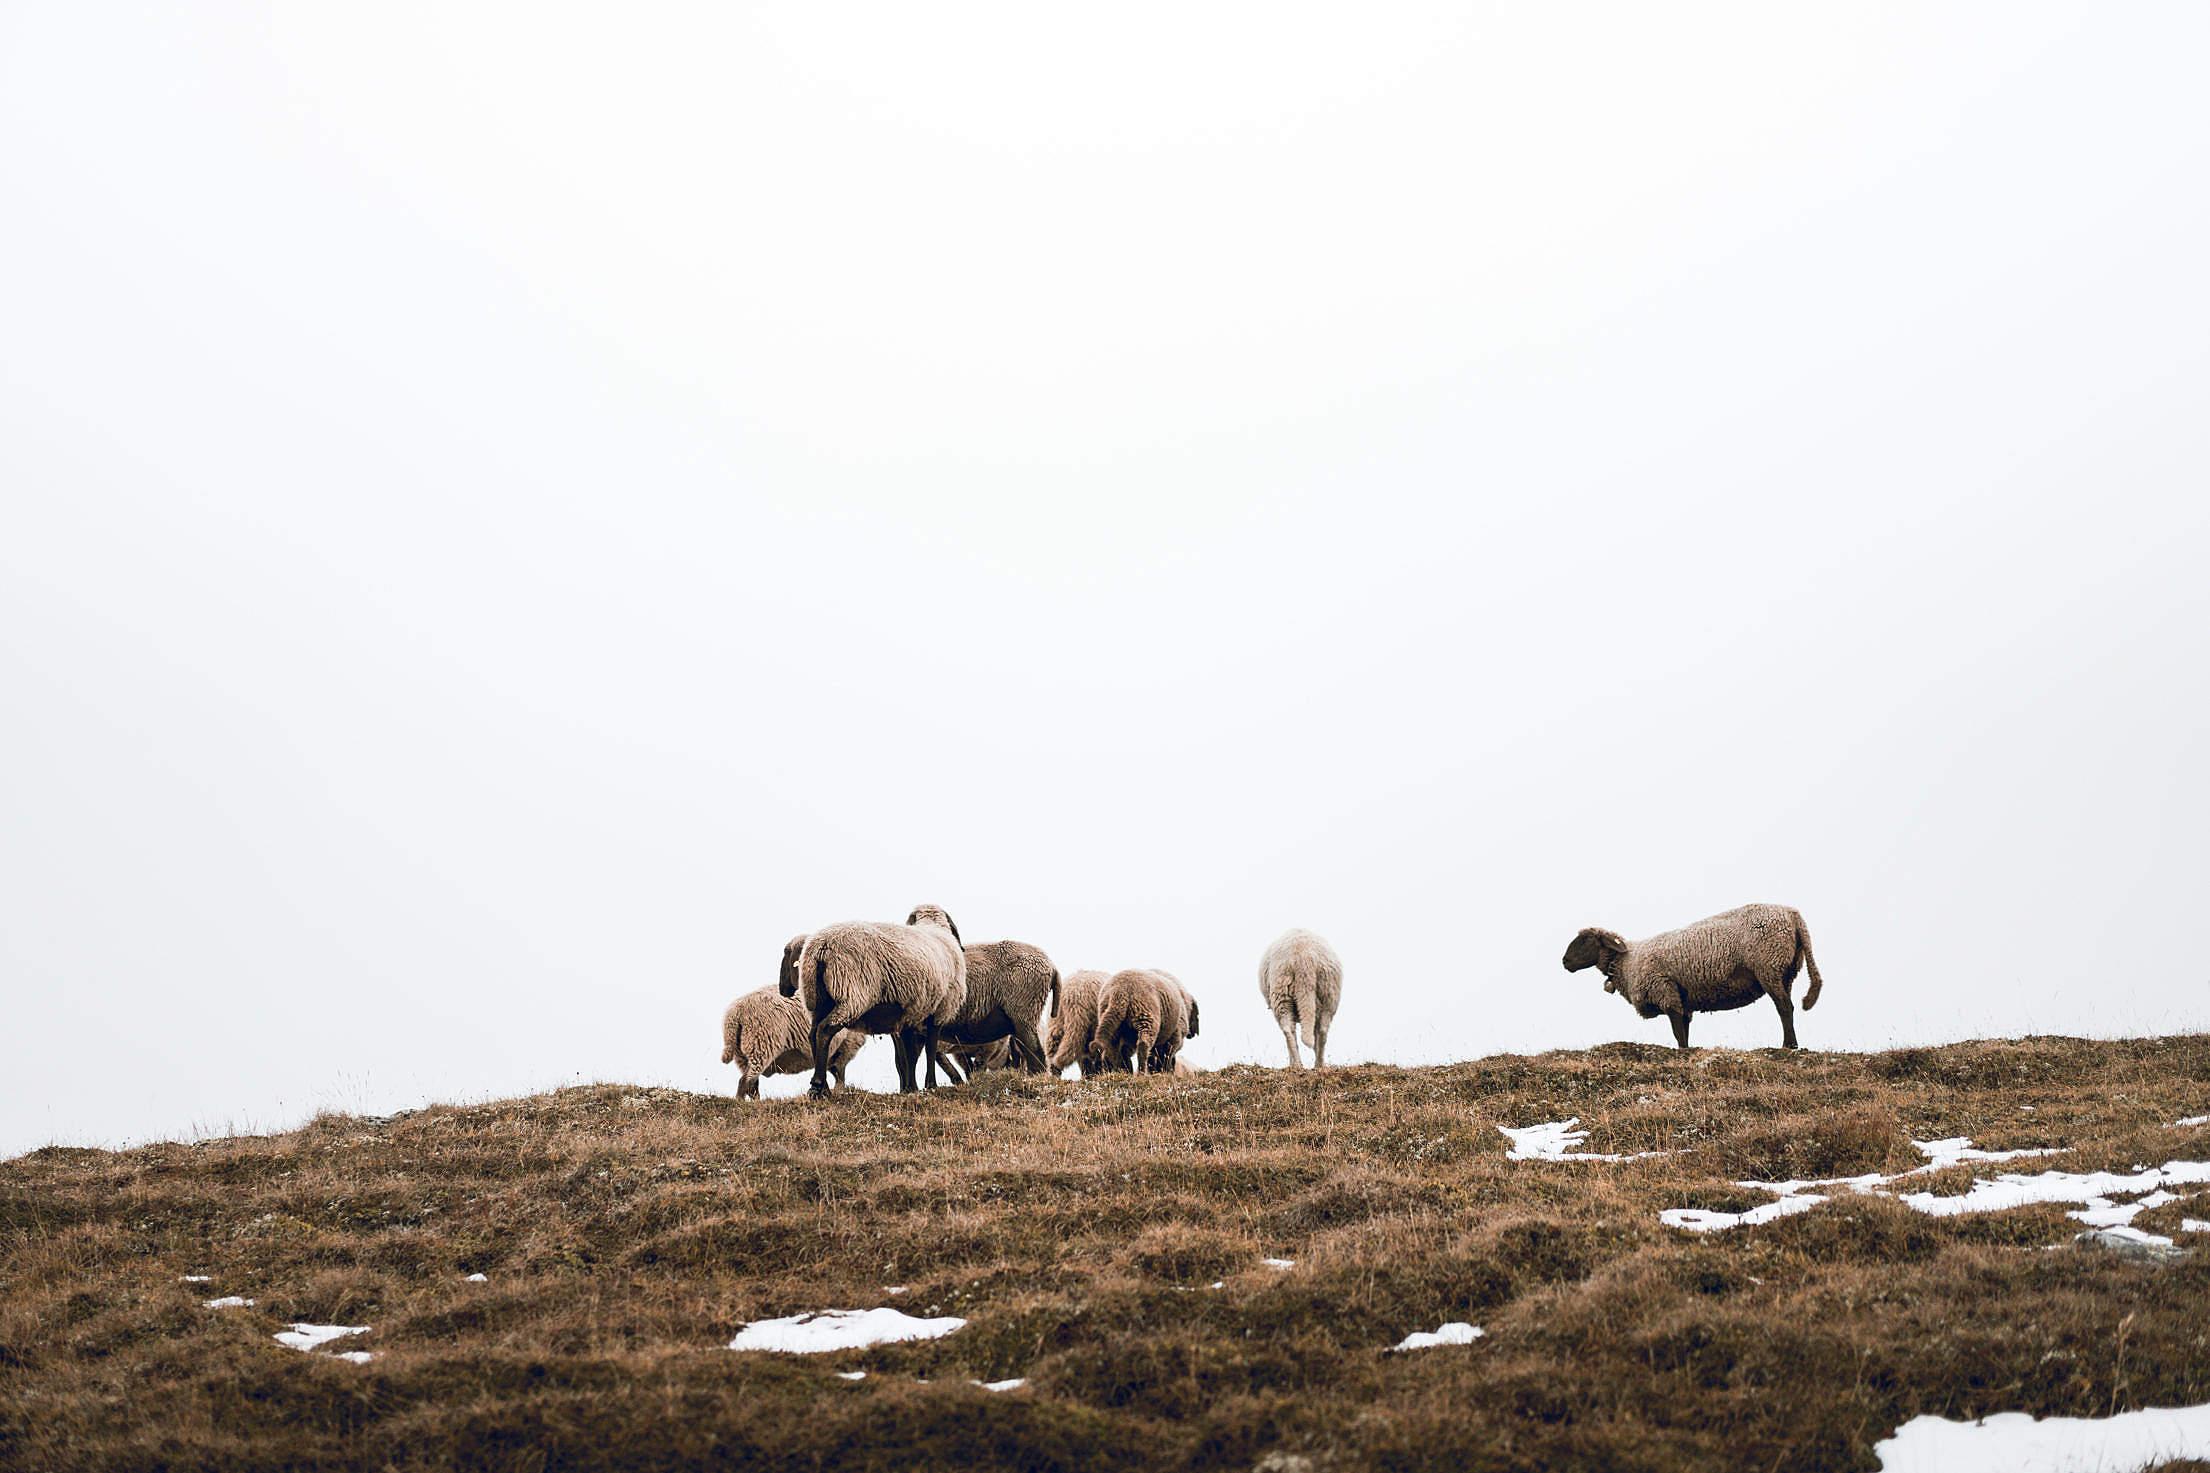 Flock of Sheep on Foggy Horizon Free Stock Photo